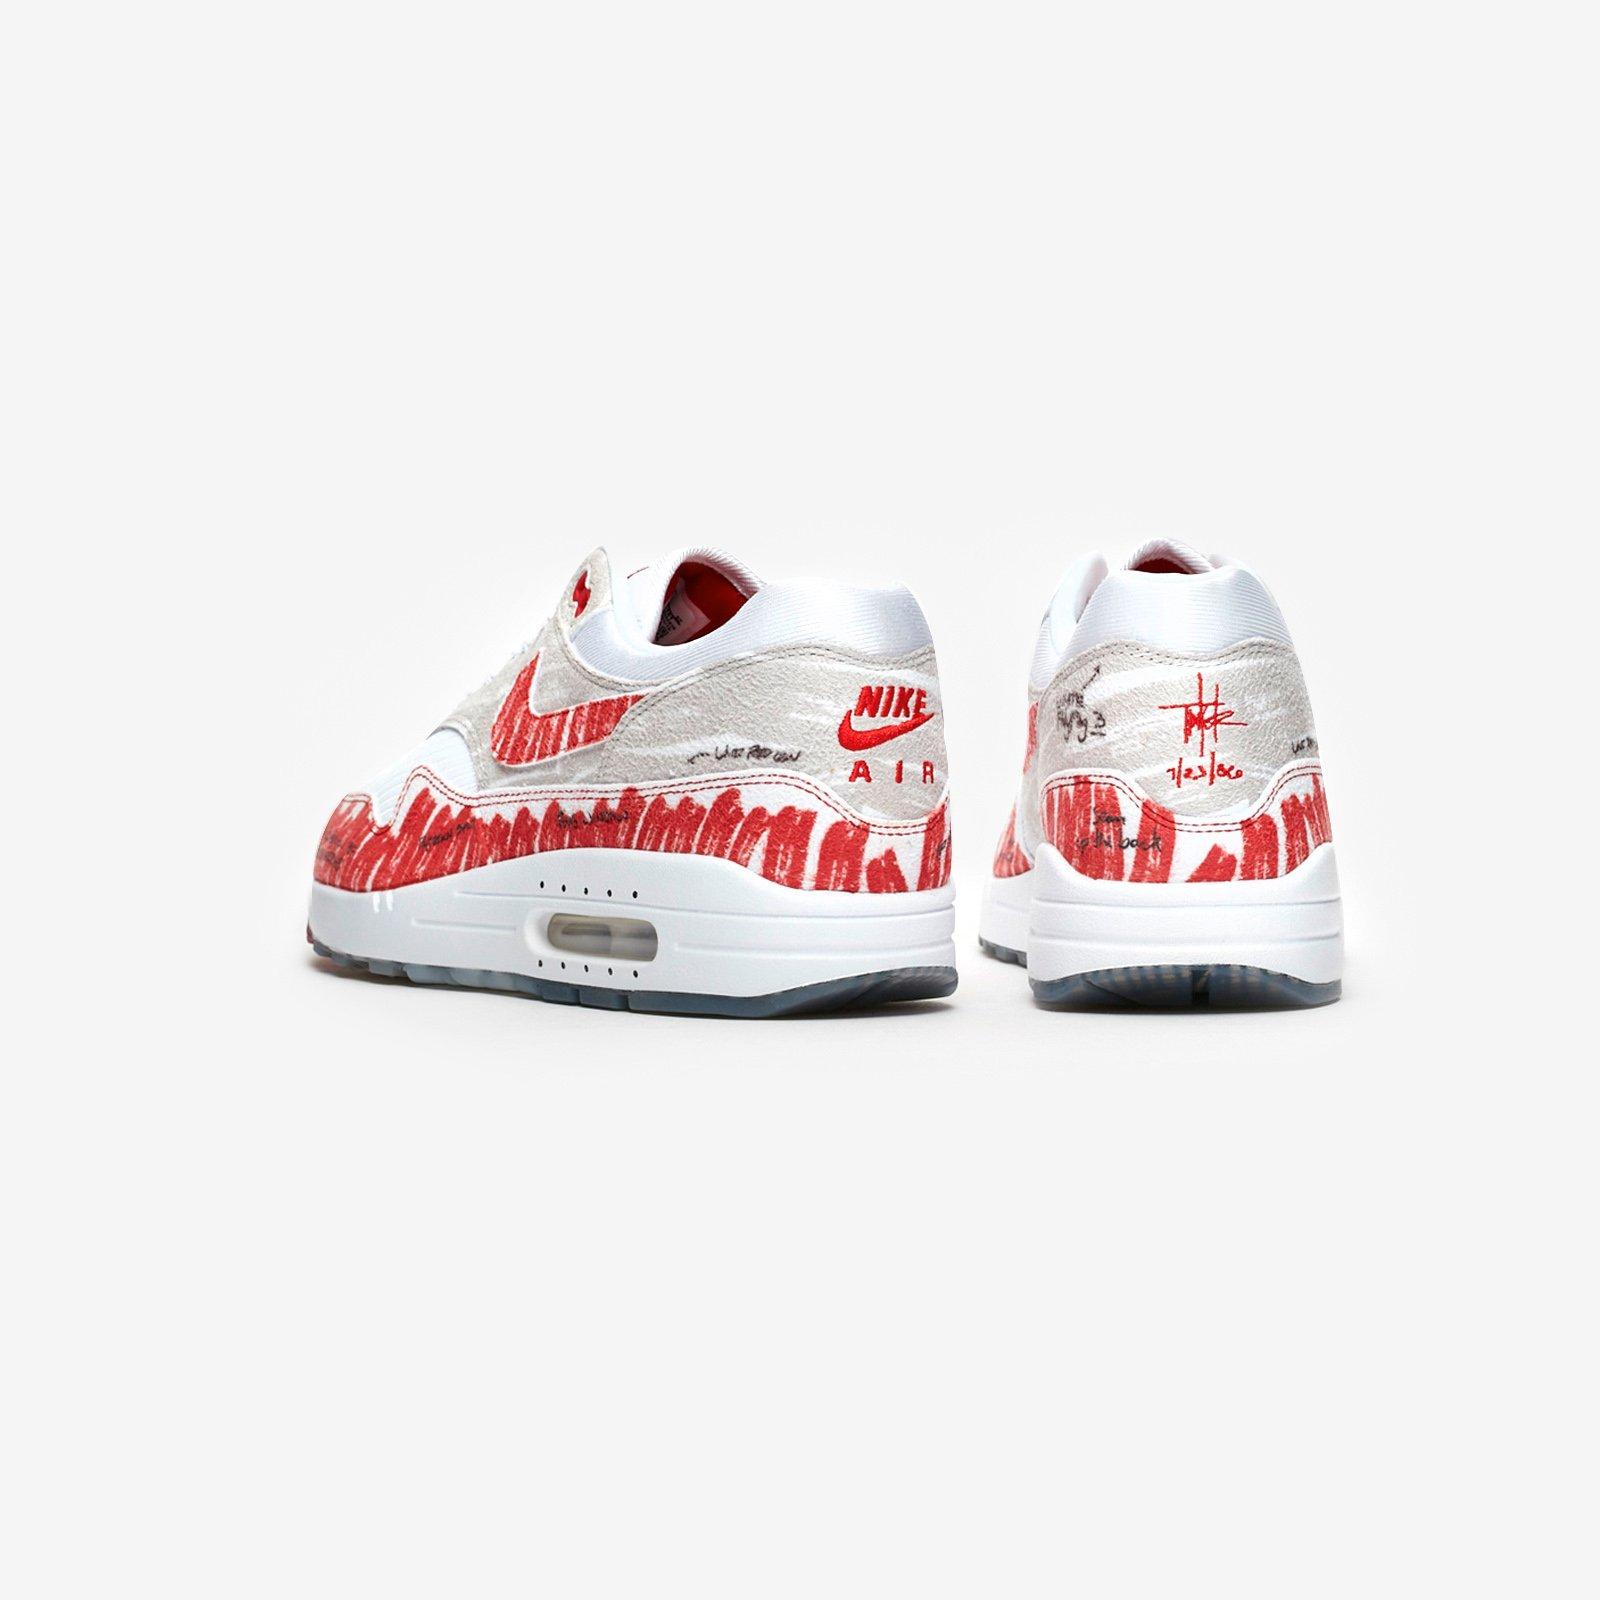 Nike Air Max 1 Sketch To Shelf Cj4286 101 Sneakersnstuff